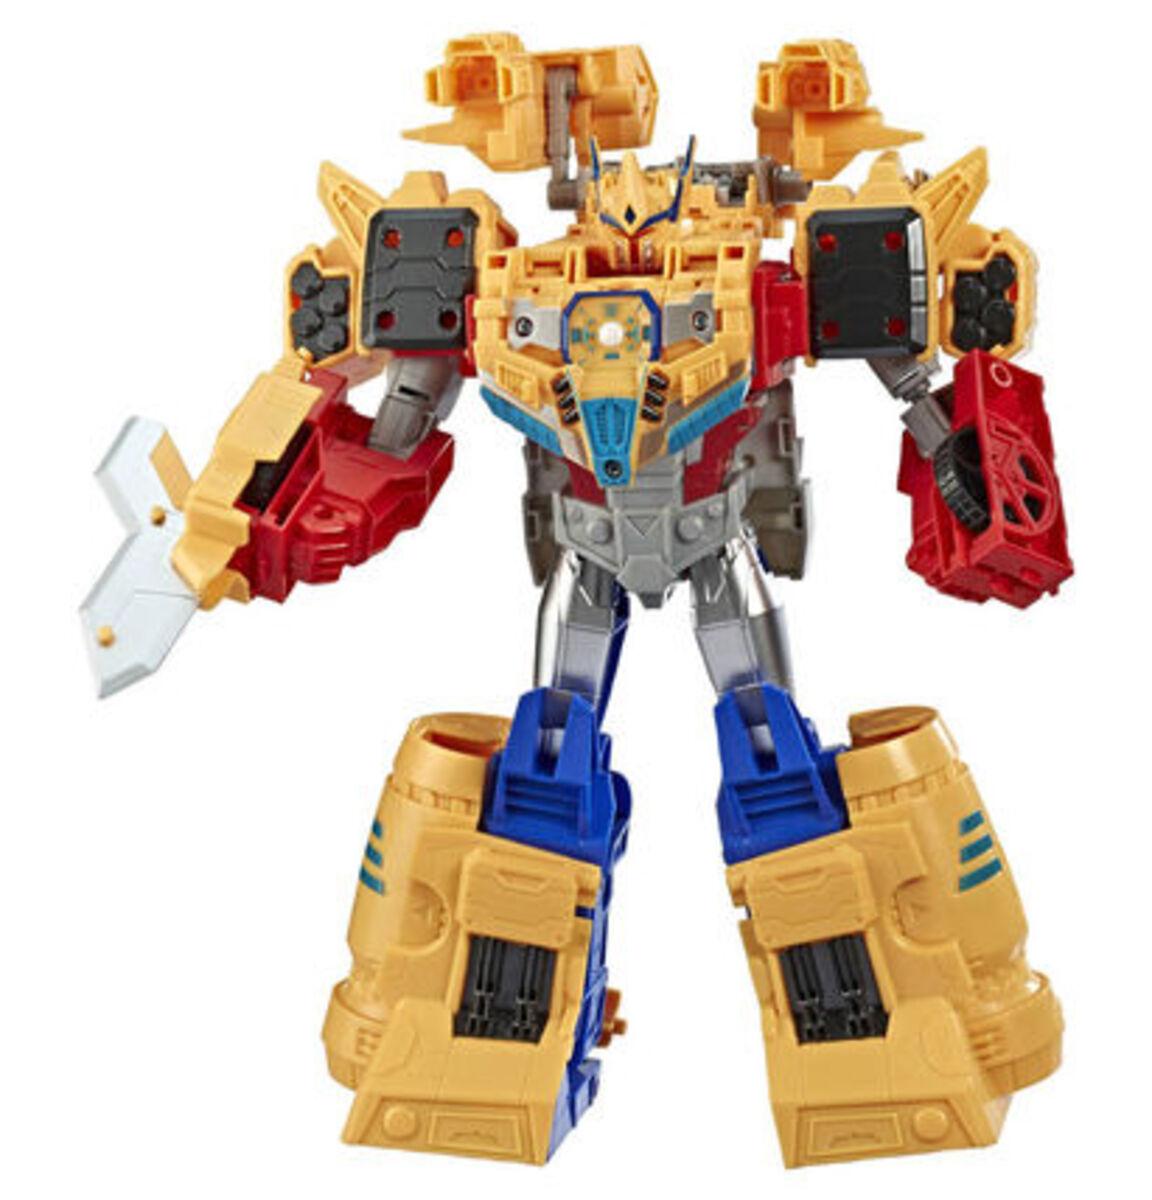 Bild 4 von Hasbro Cyberverse Spark Armor Ark Power Optimus Prime